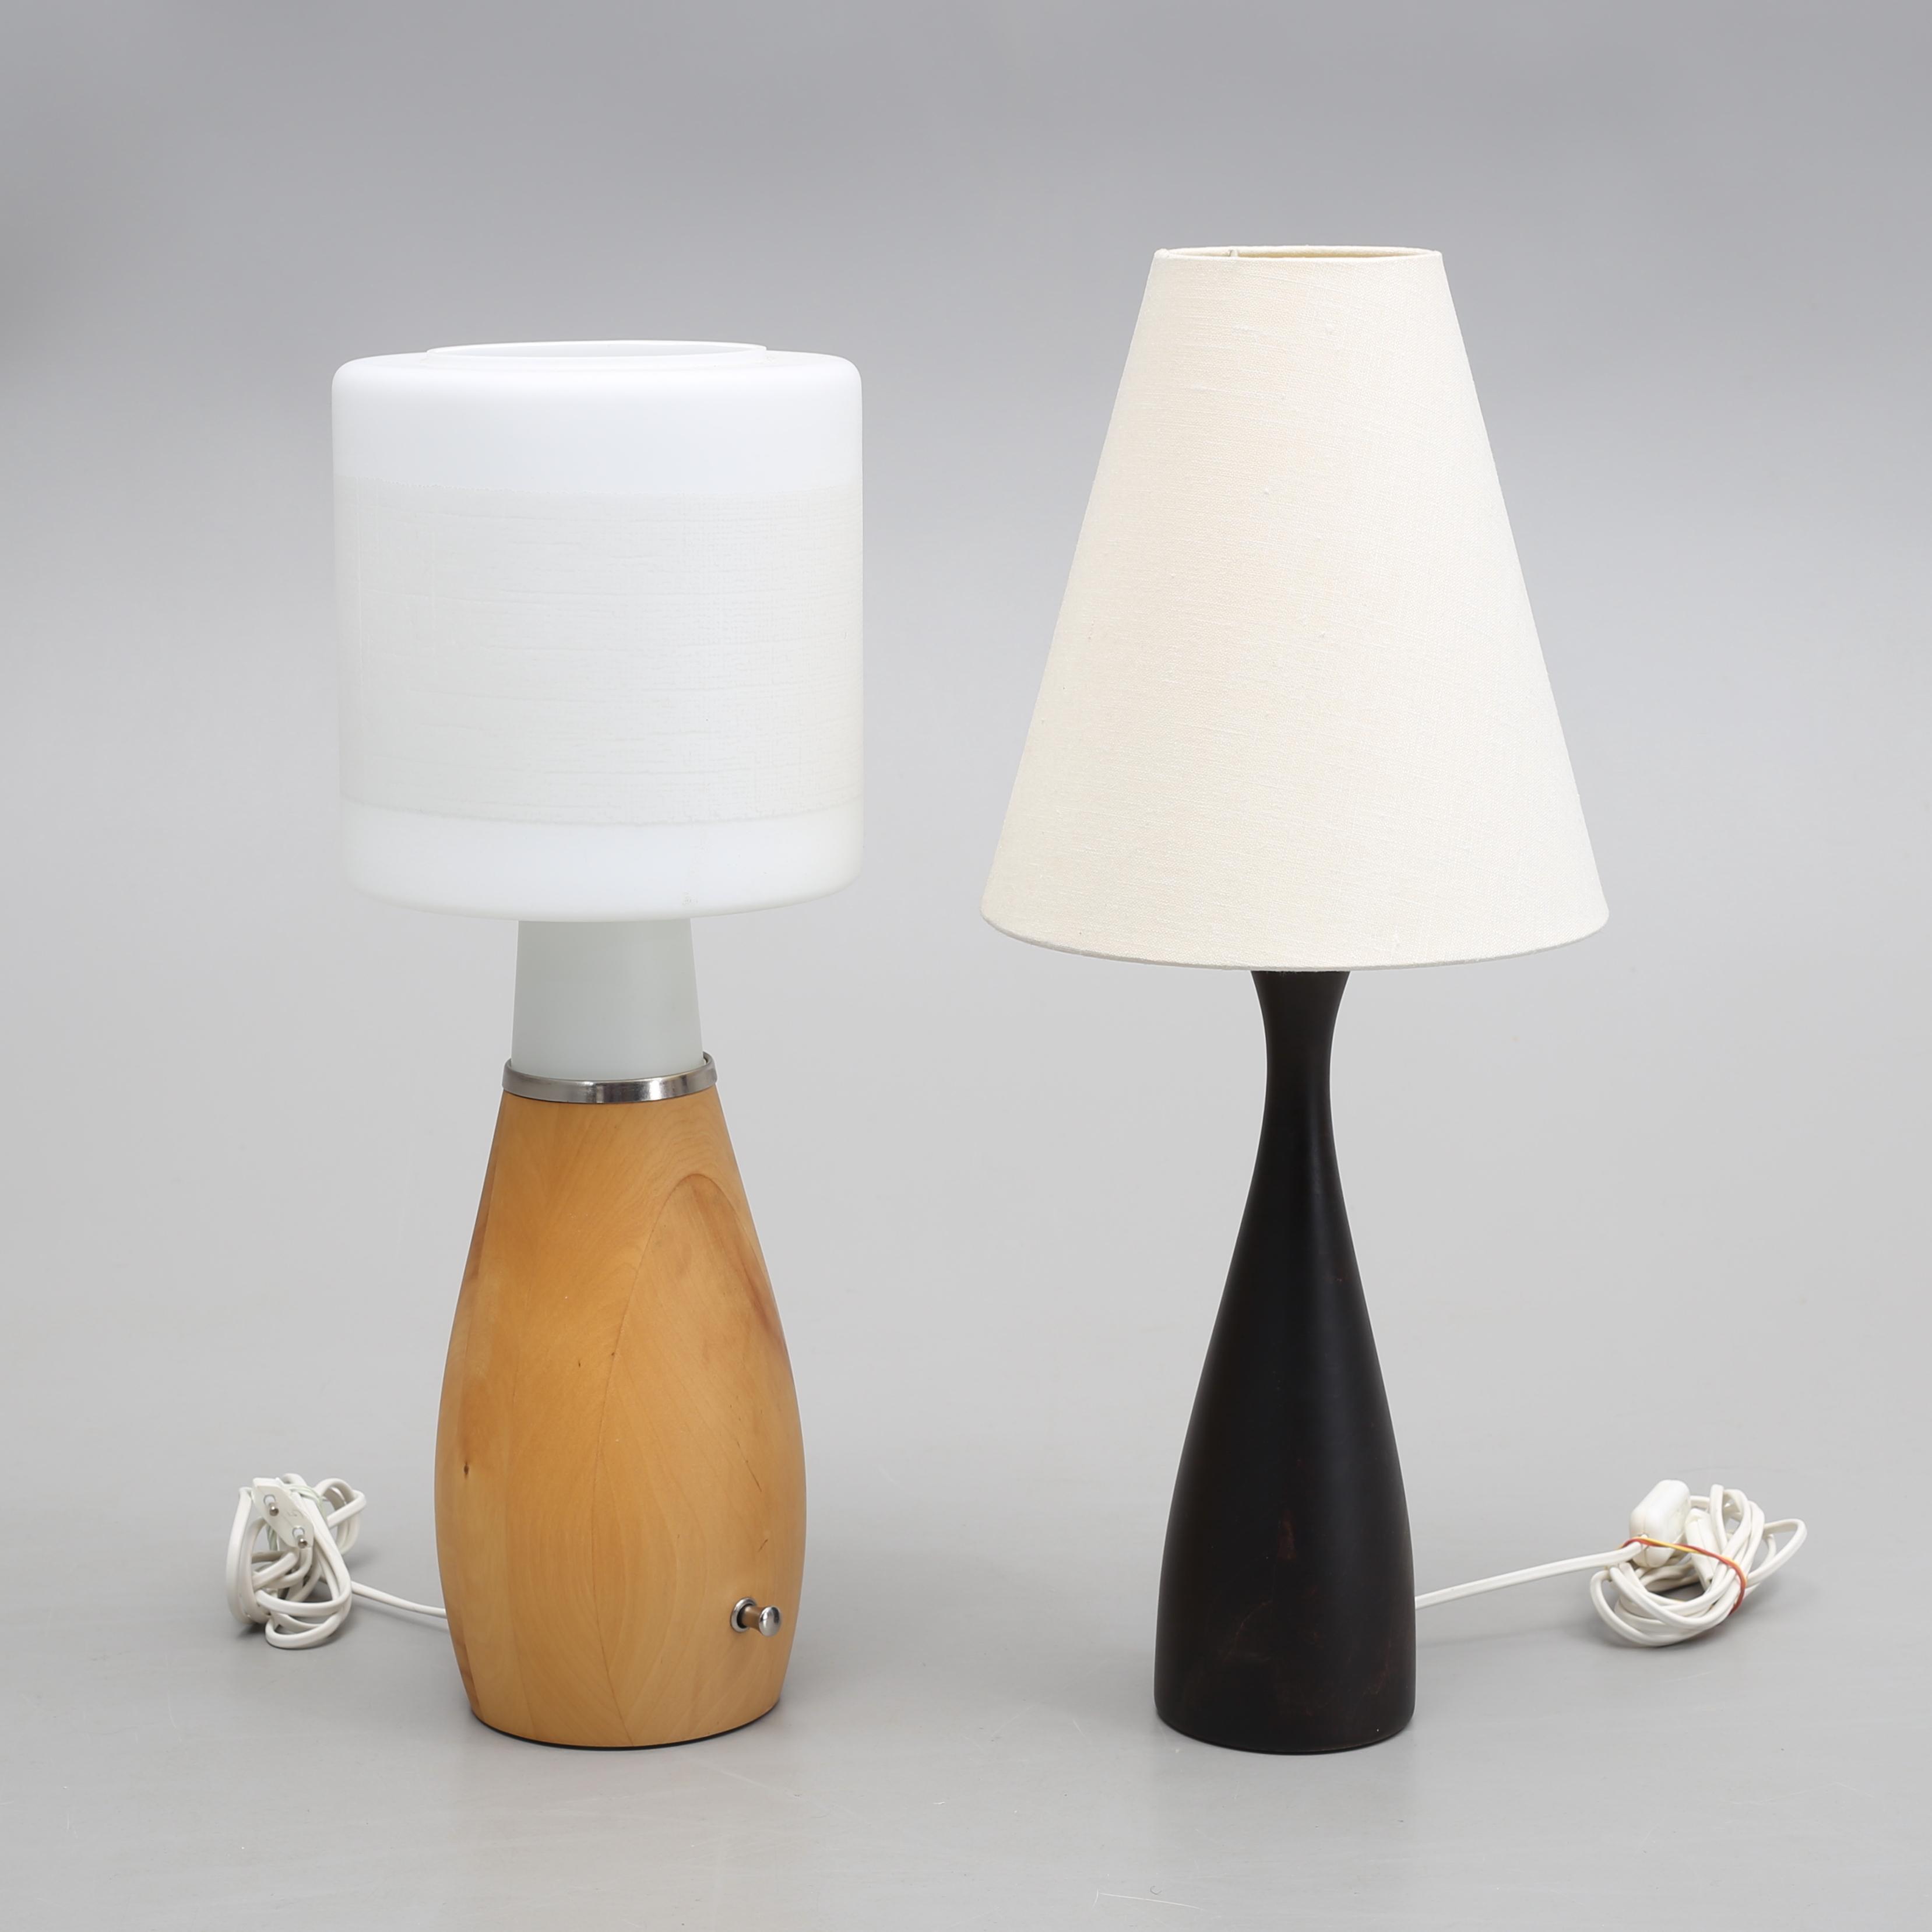 TABLE LAMP, 2 pcs, wood glass, IKEA. Lighting & Lamps